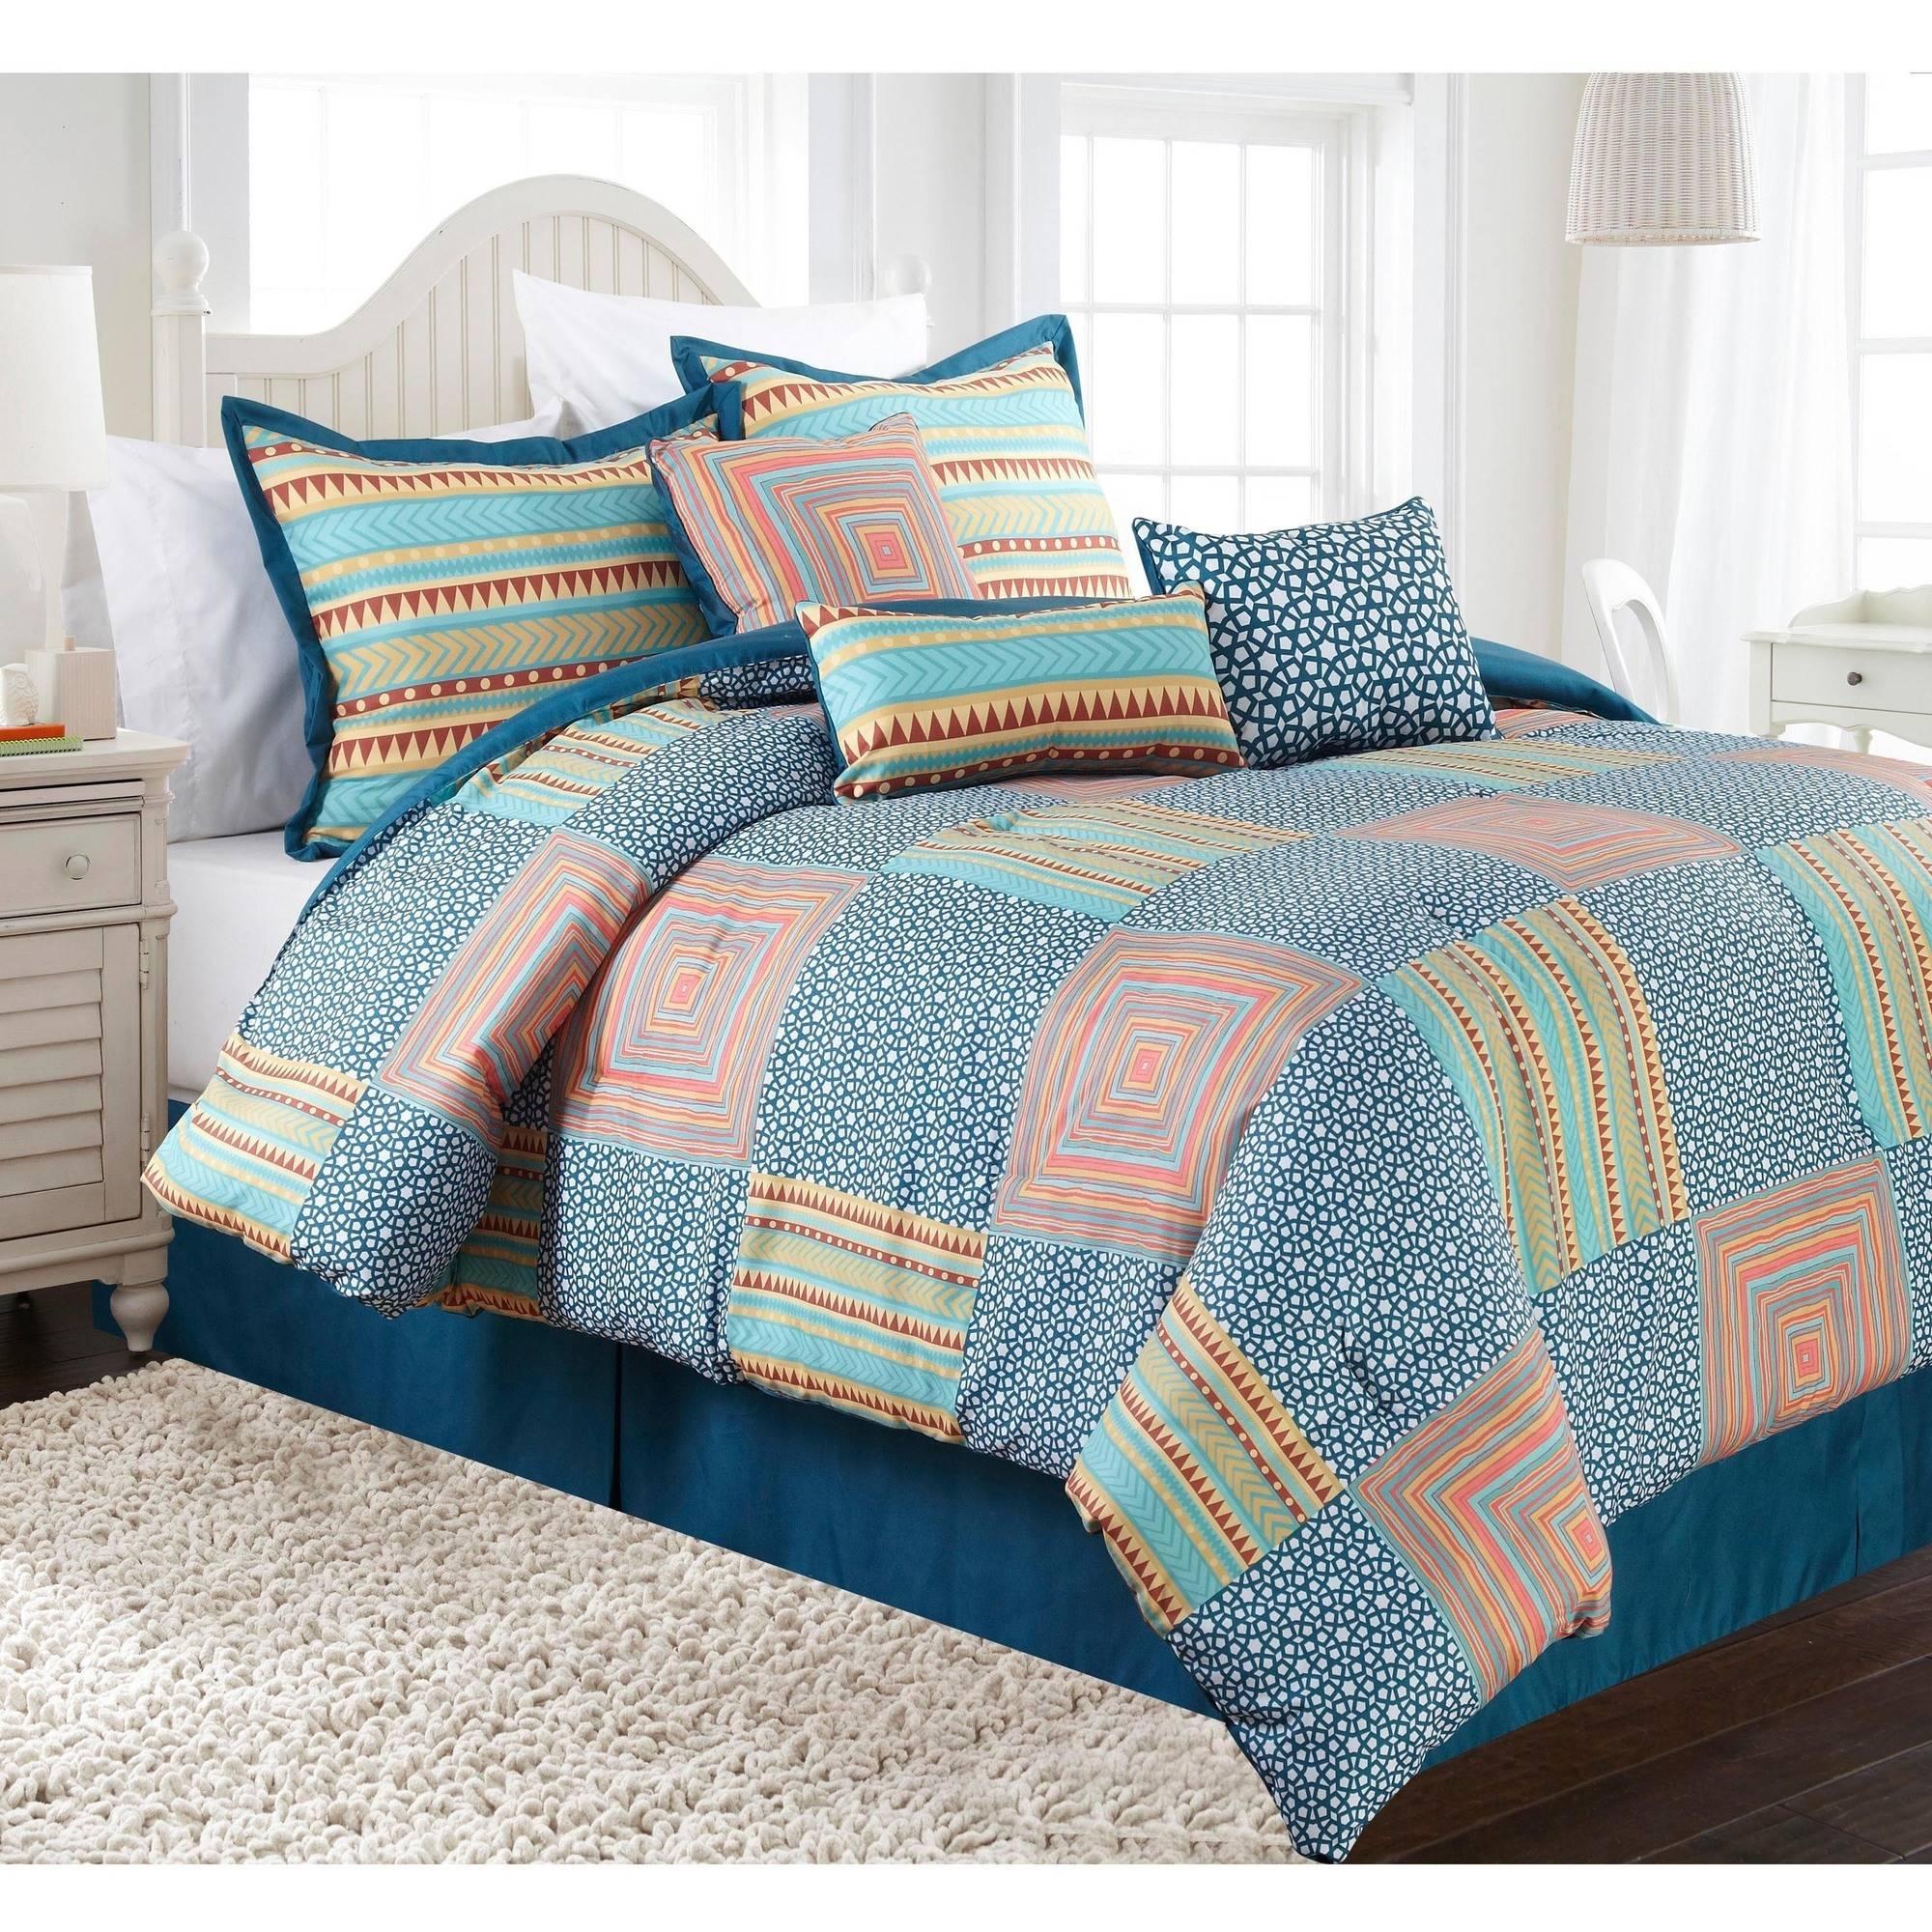 Amias 7-Piece Bedding Comforter Set